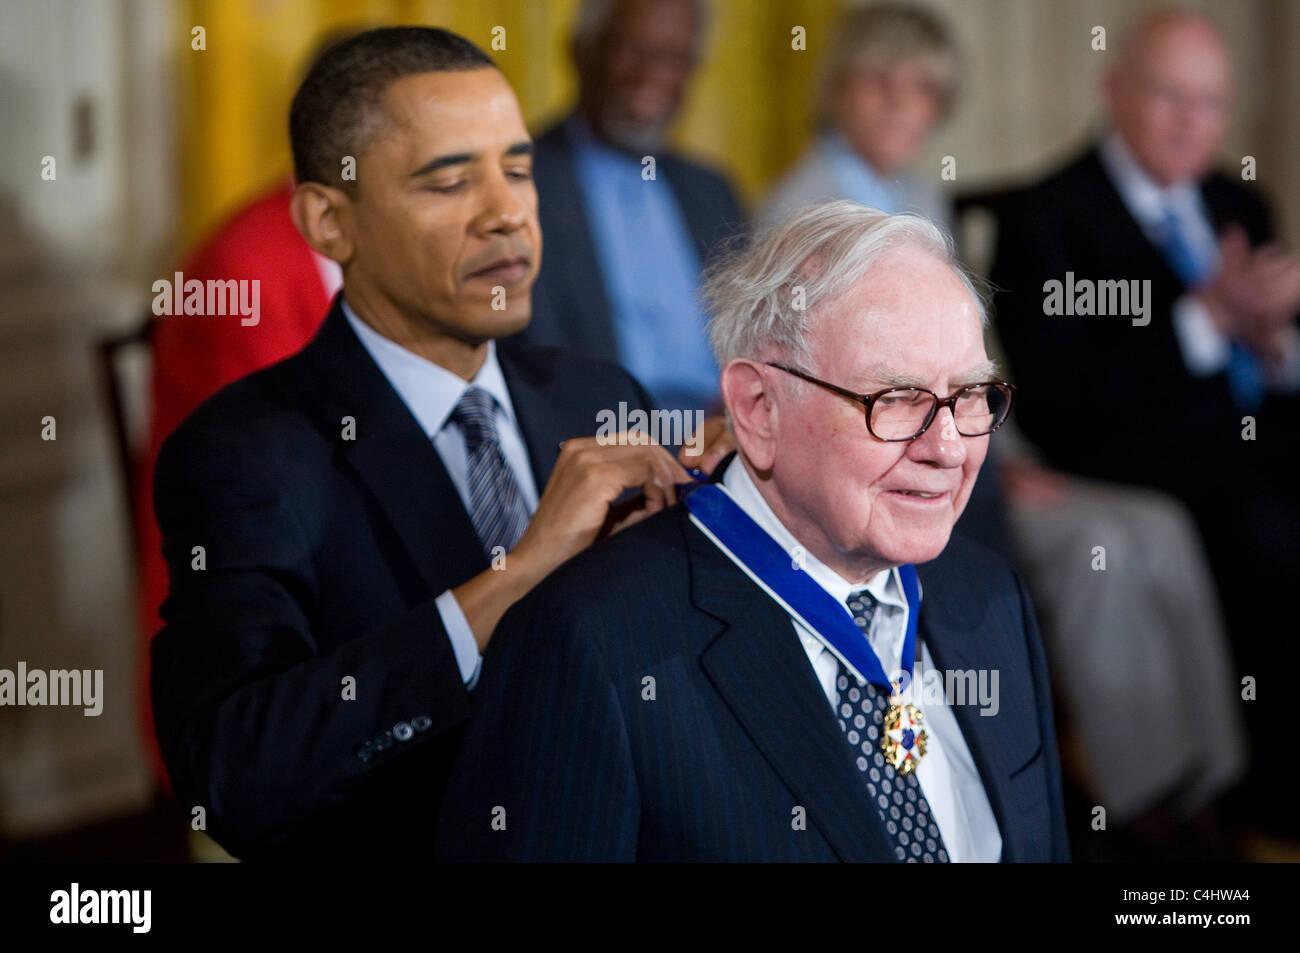 President Barack Obama presents the Presidential Medal of Freedom to Warren Buffett. - Stock Image